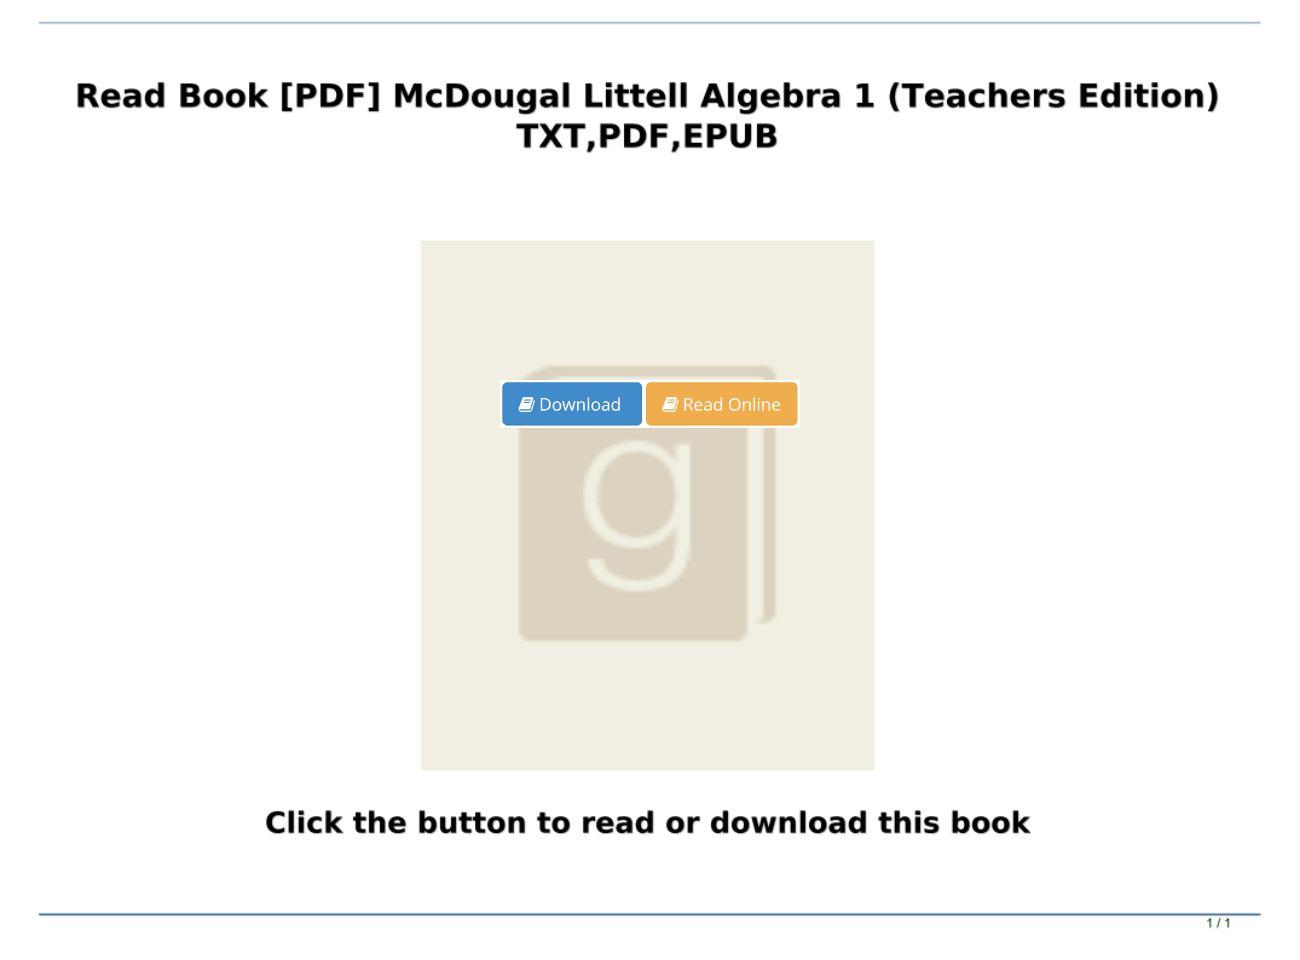 Mcdougal Littell Algebra 1 Pdf Download